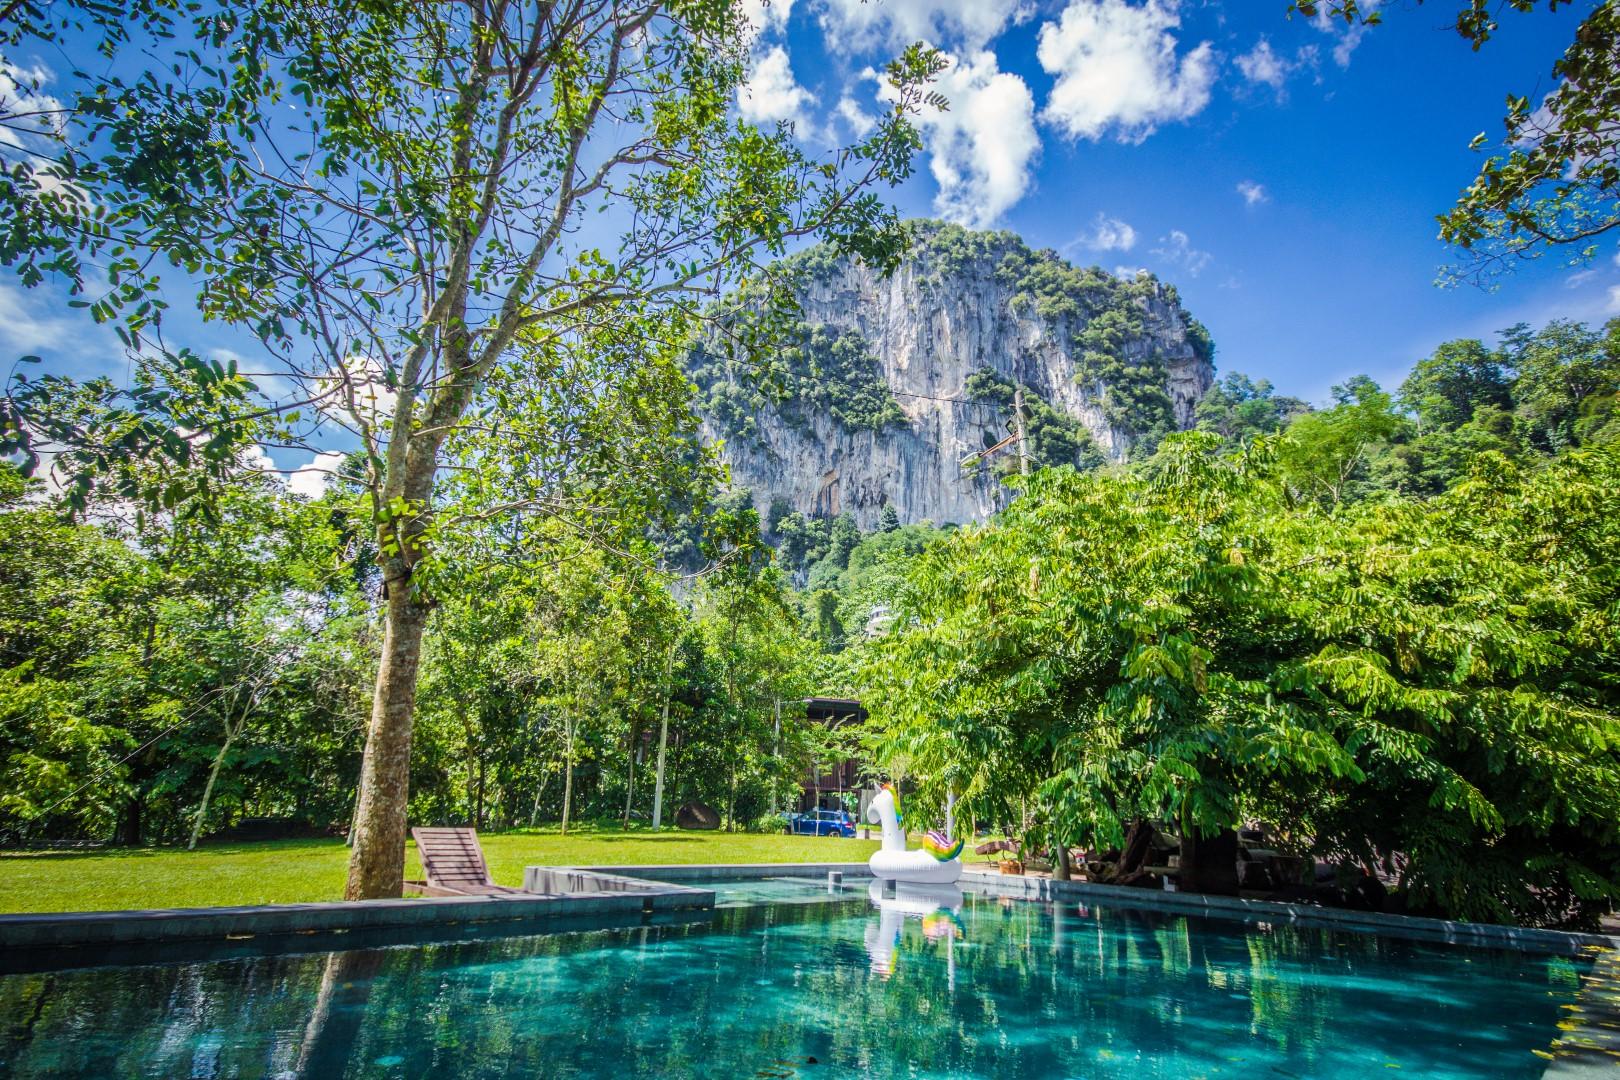 Bukit Takun & Pool